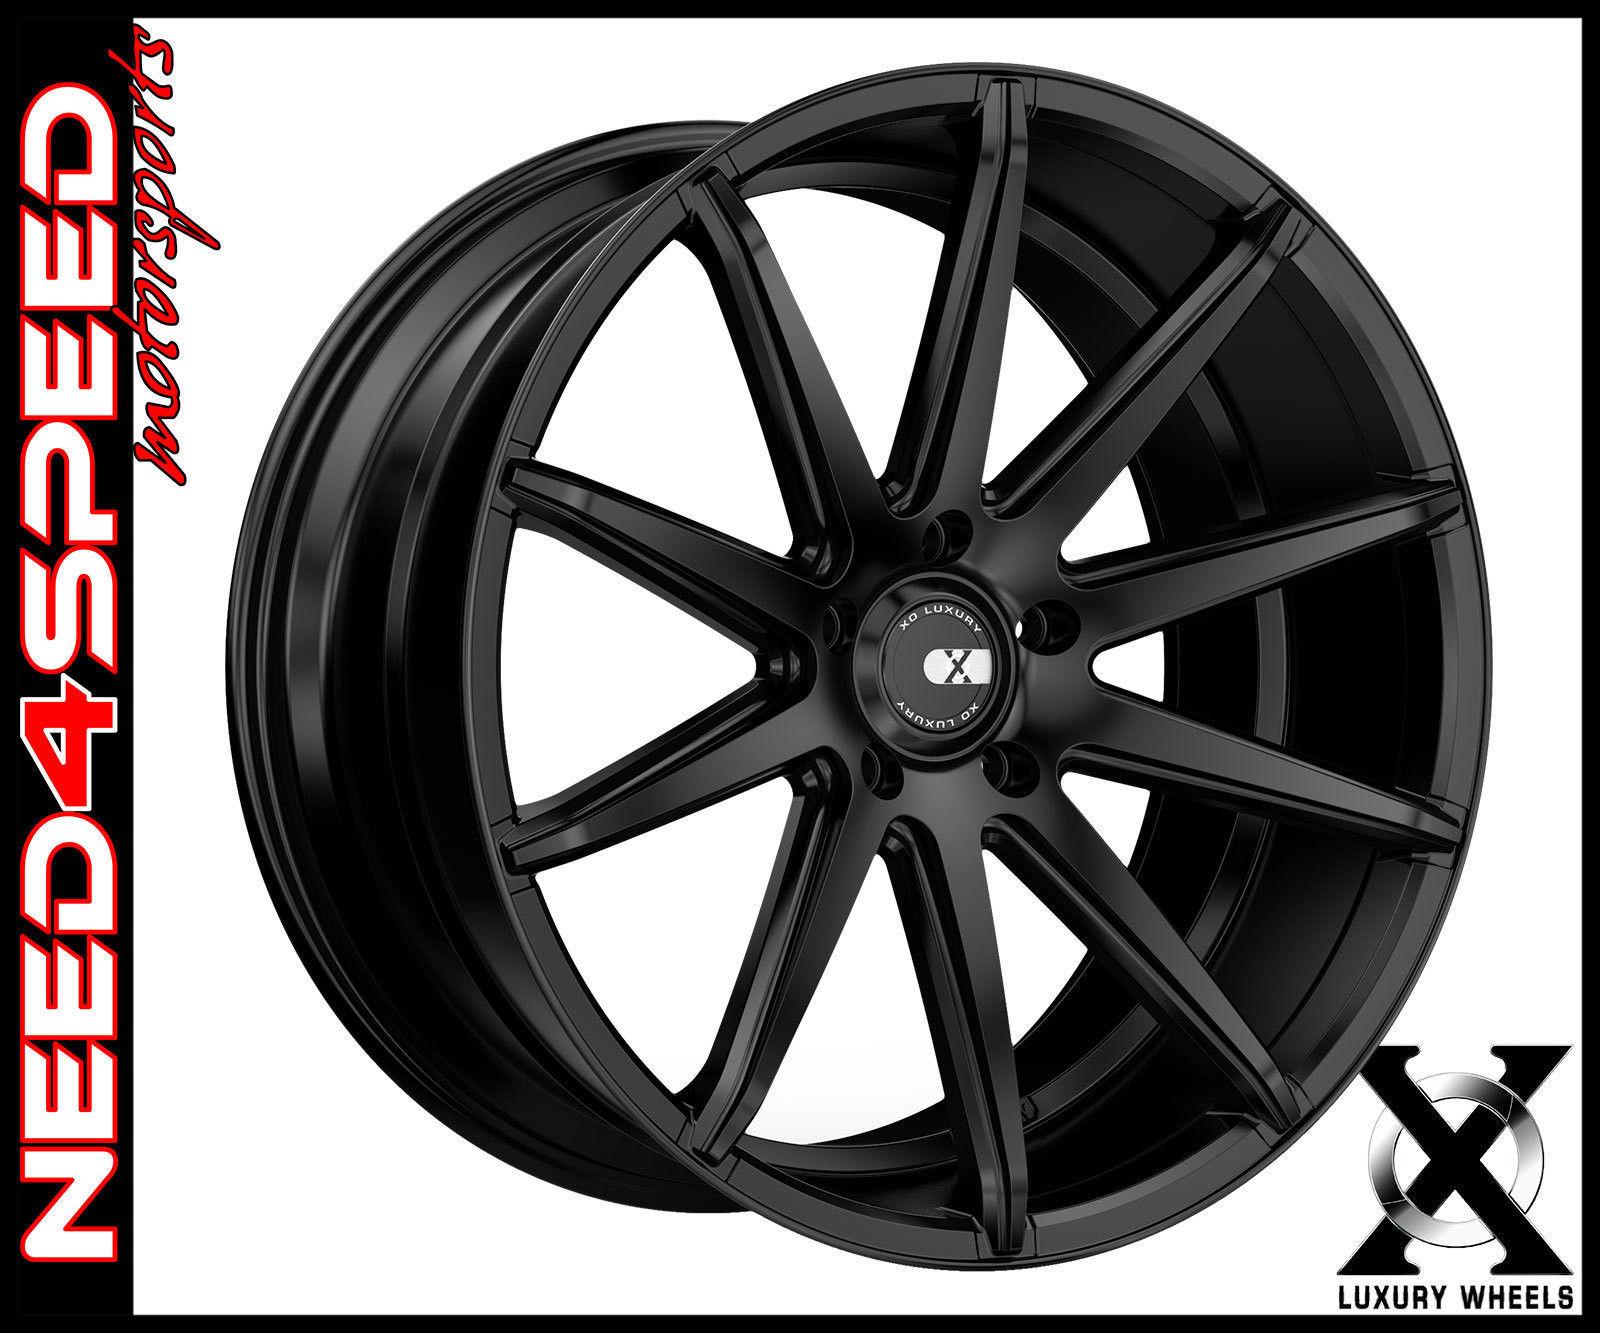 20 xo luxury sydney matte black concave wheels for jeep. Black Bedroom Furniture Sets. Home Design Ideas